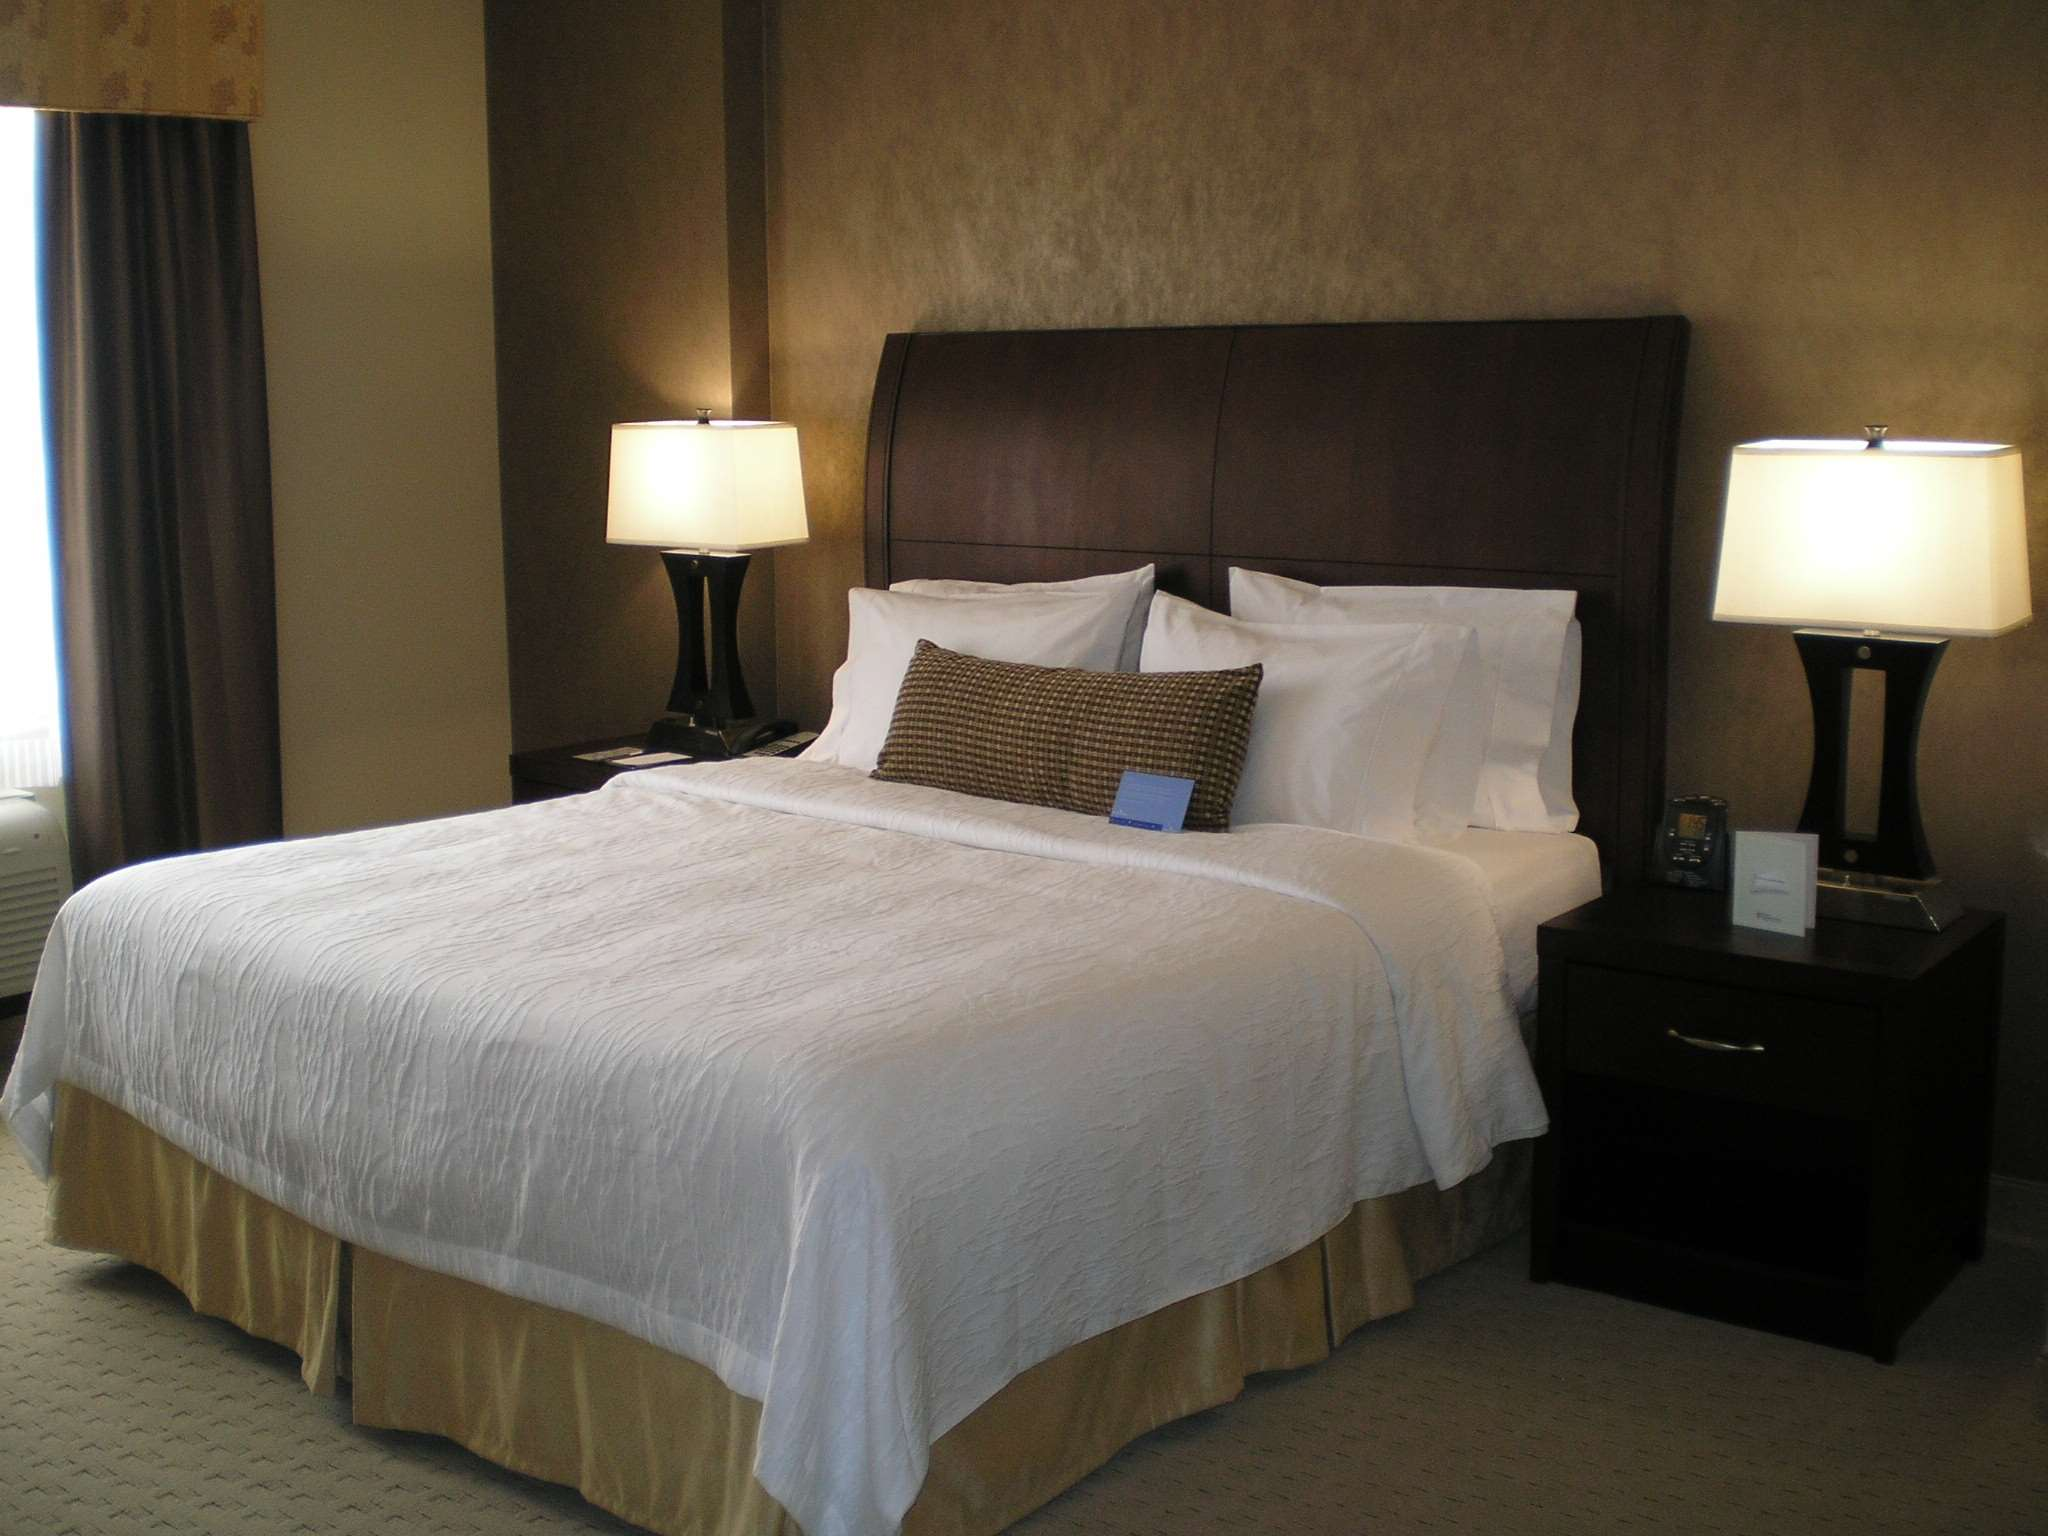 Hilton Garden Inn DFW North Grapevine image 29